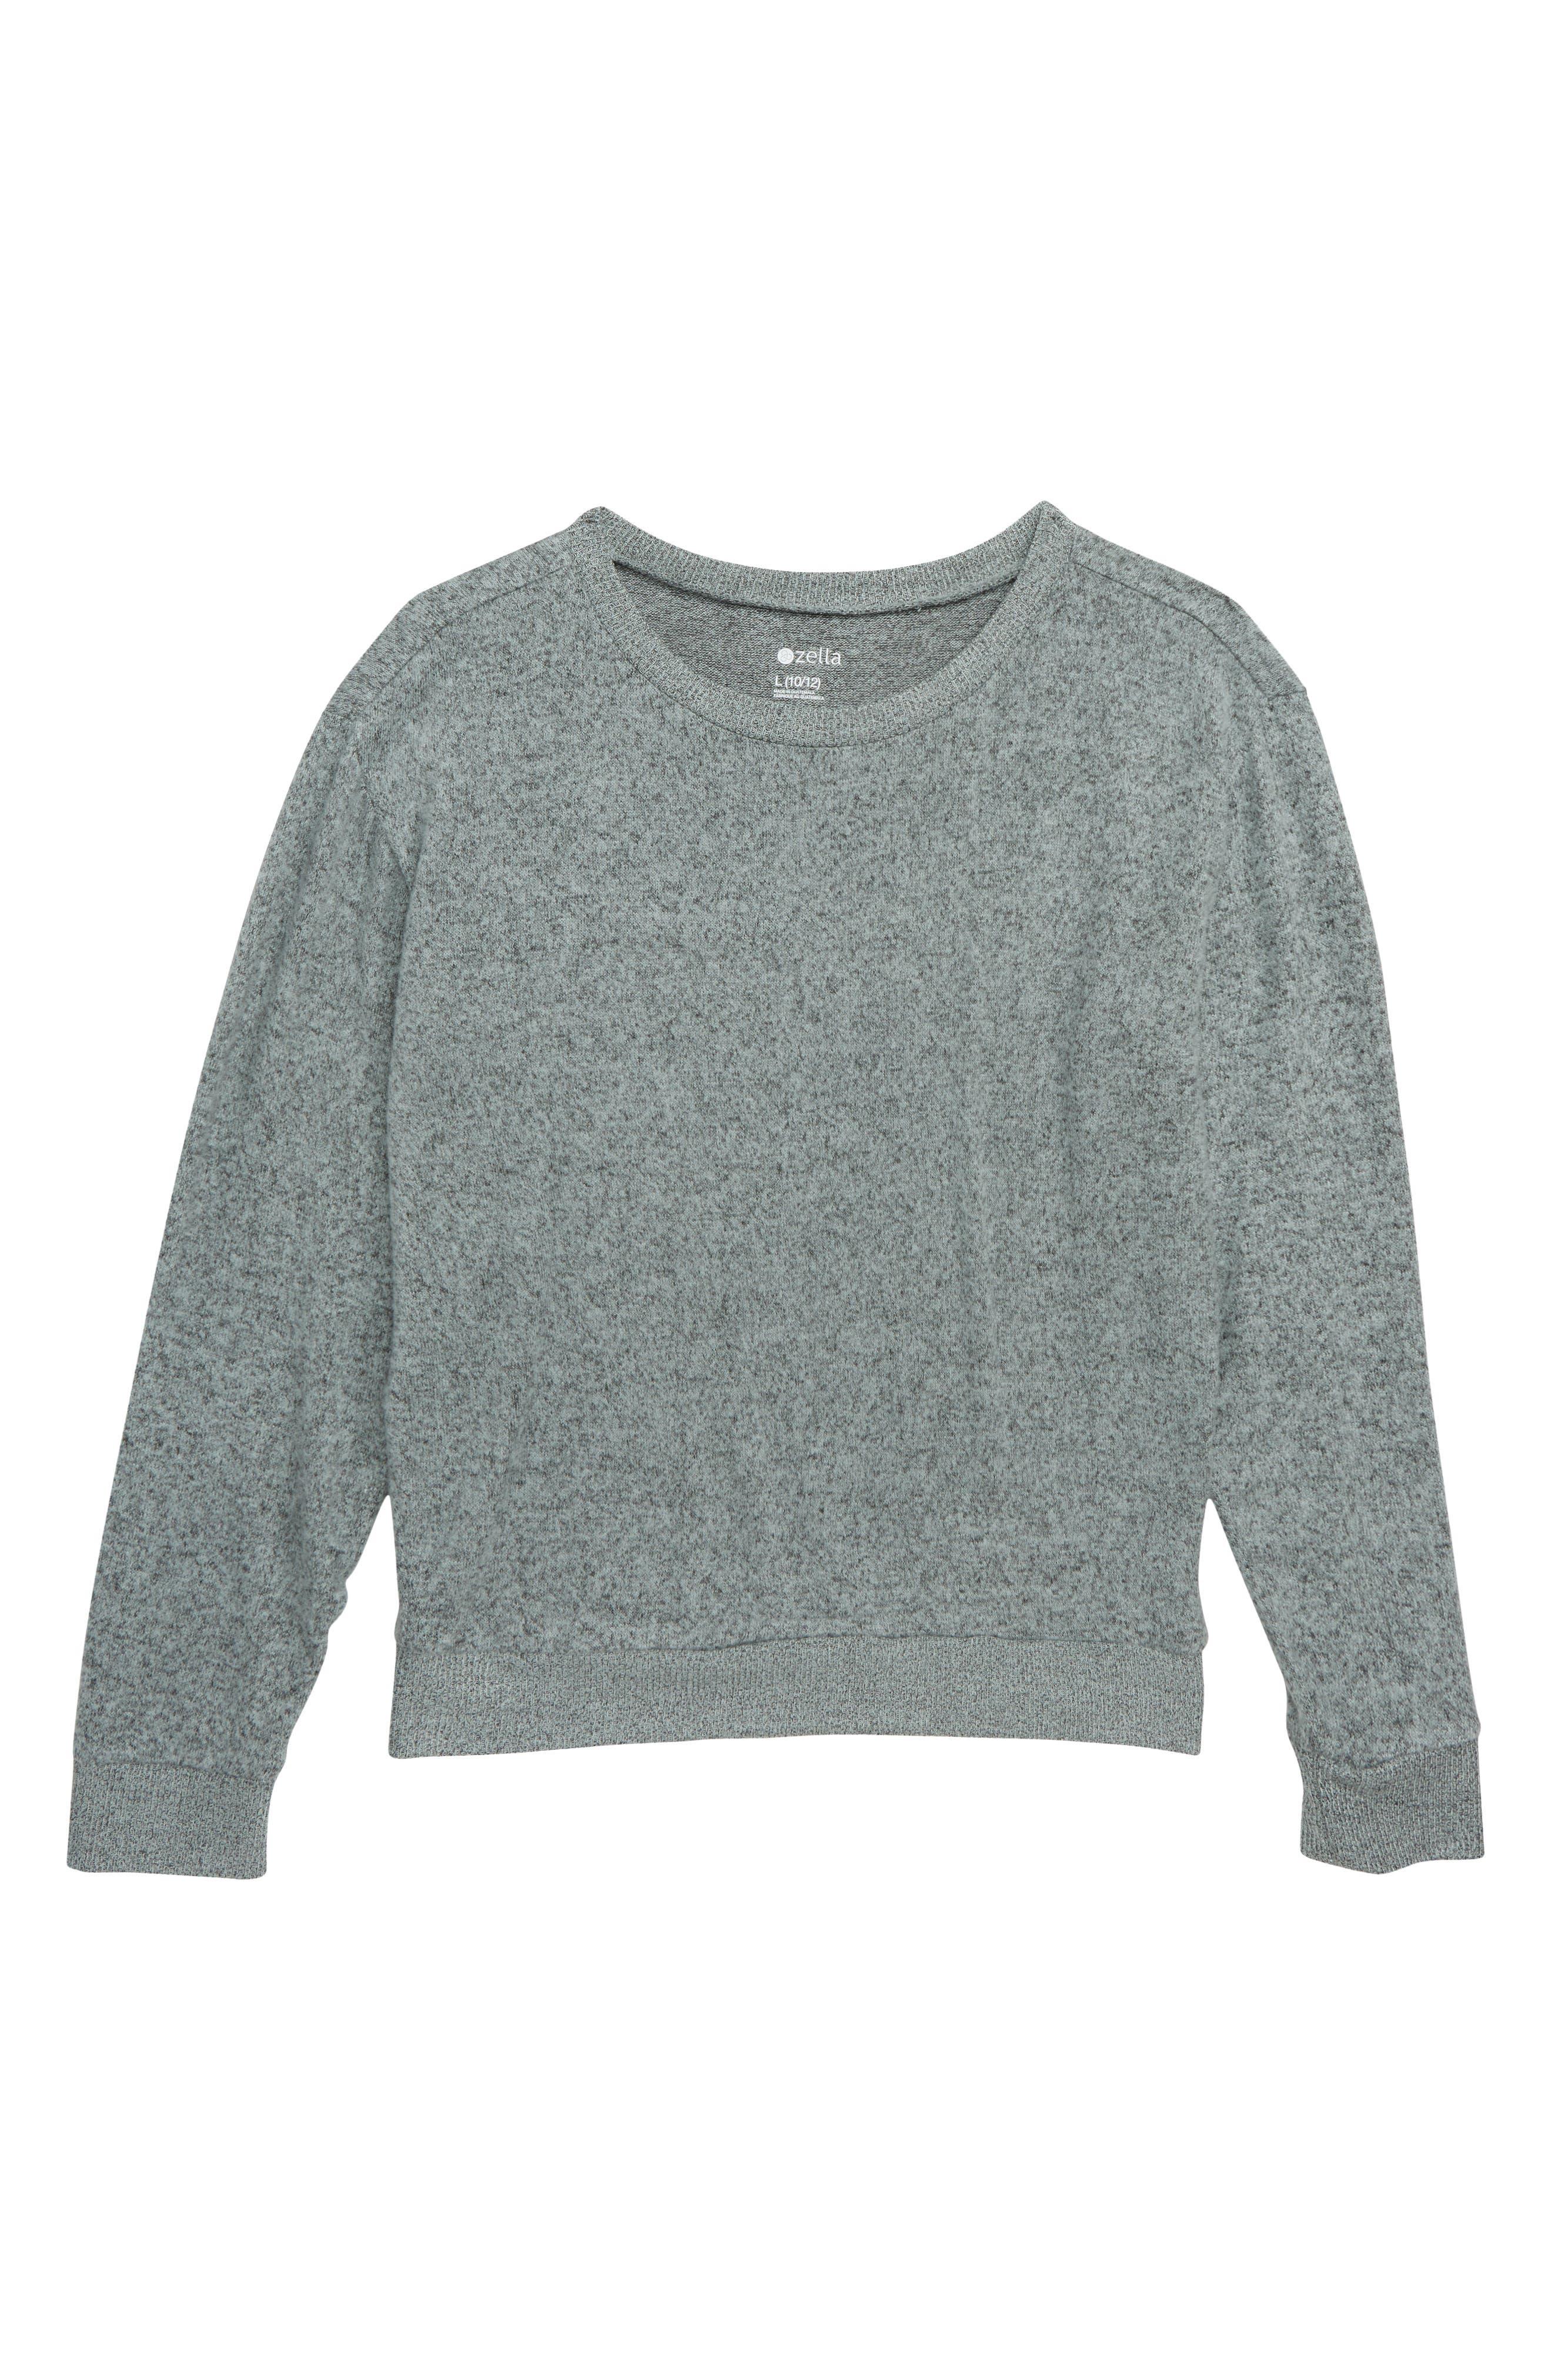 Girls Zella Girl Supersoft Sweater